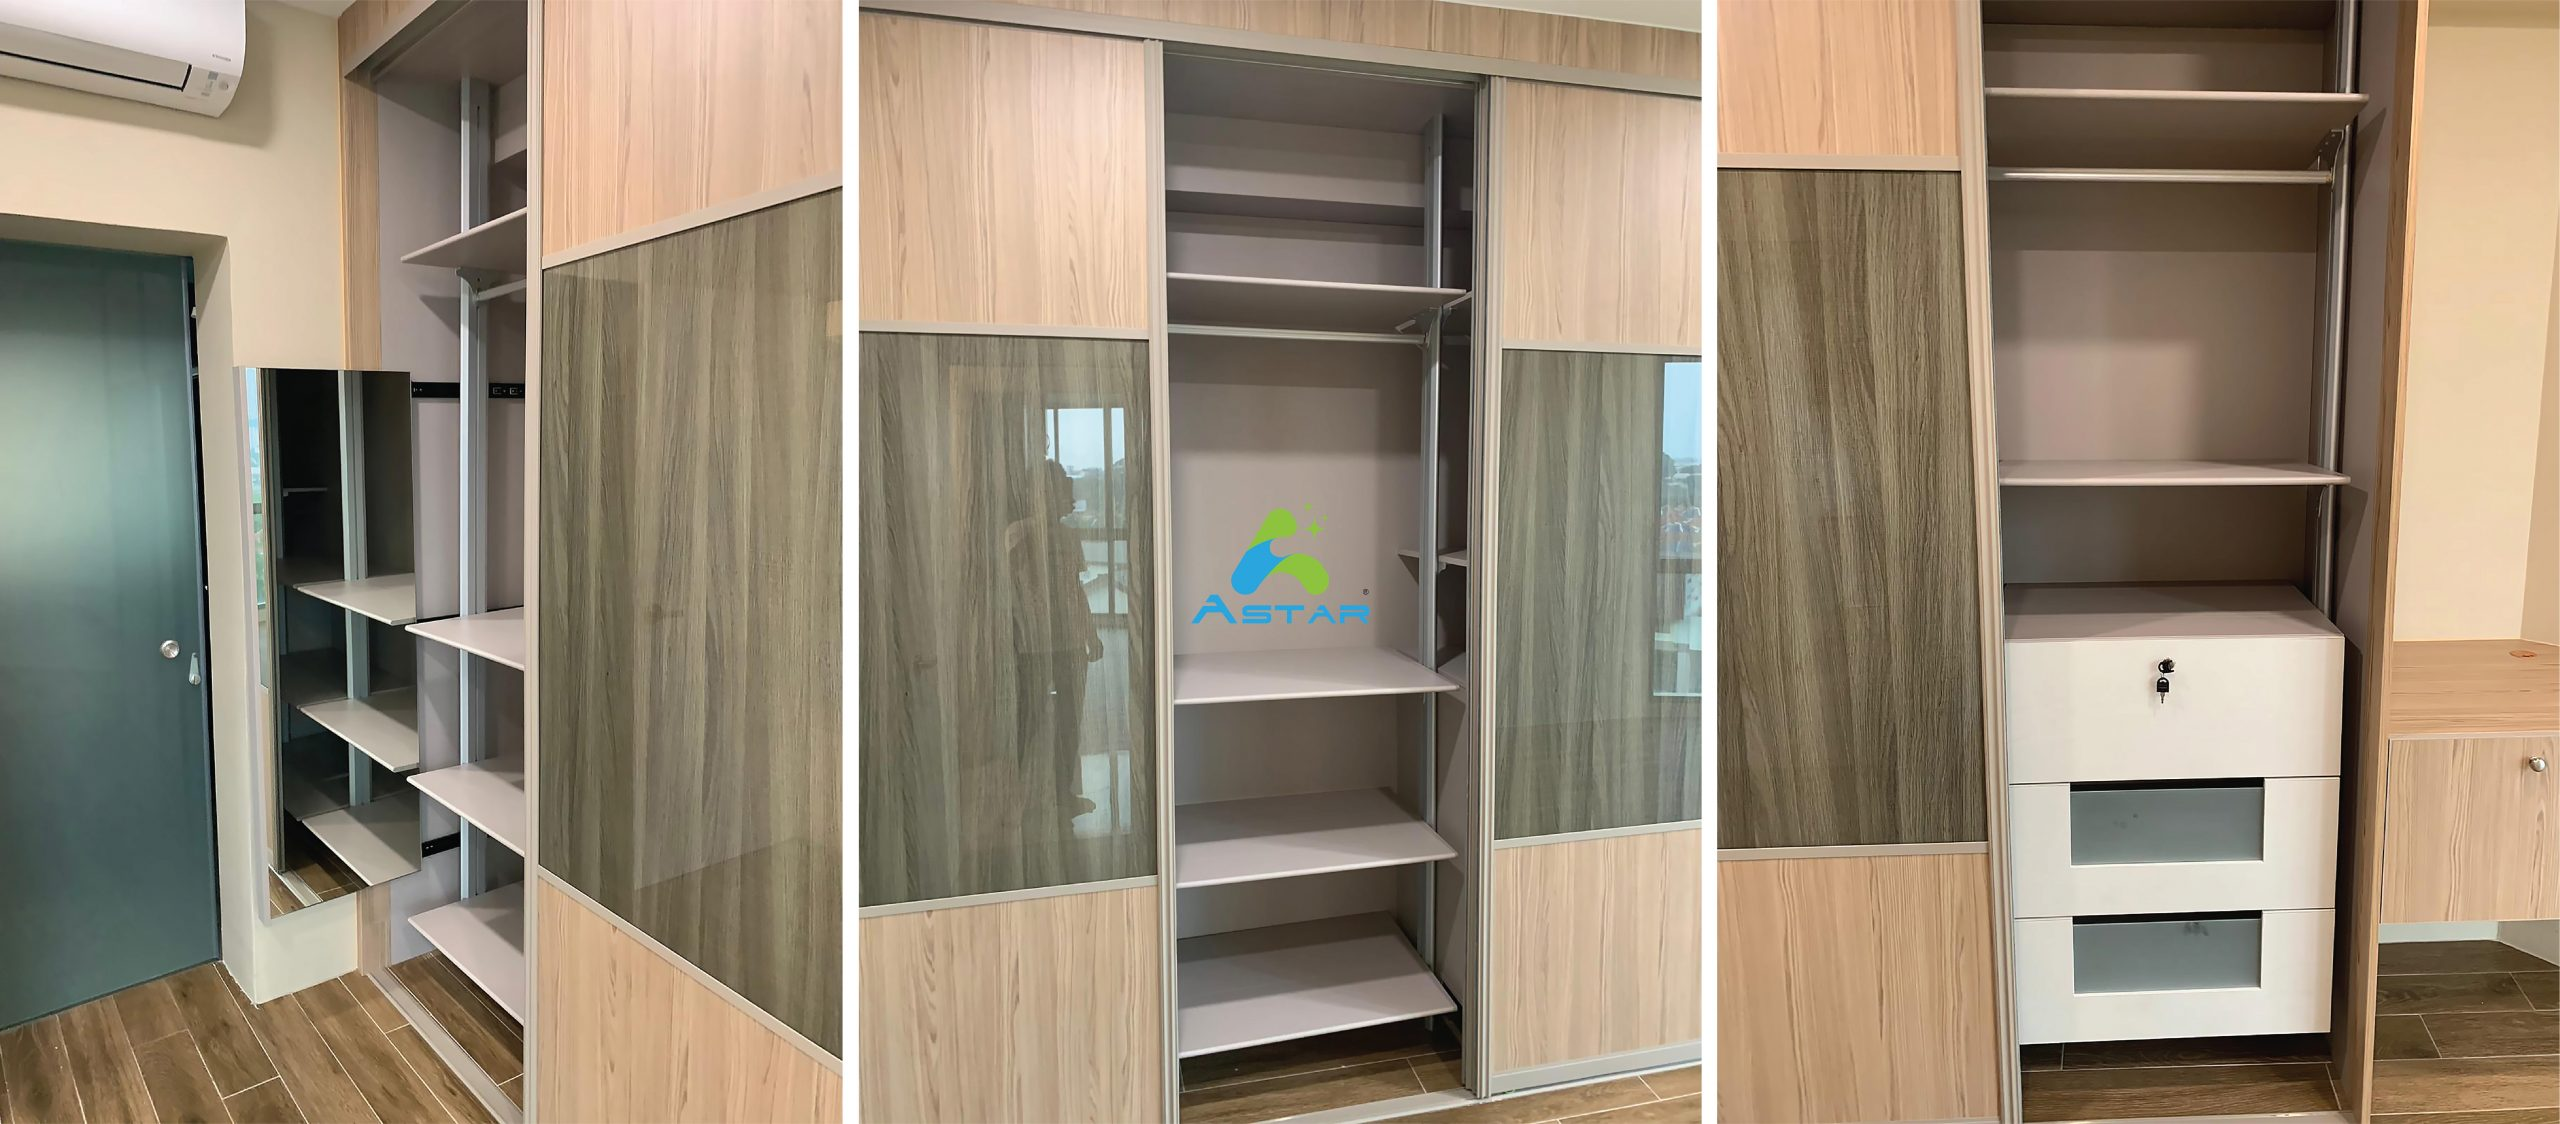 astar furnishing aluminum furniture projects Yew Mei Green Condominium 15